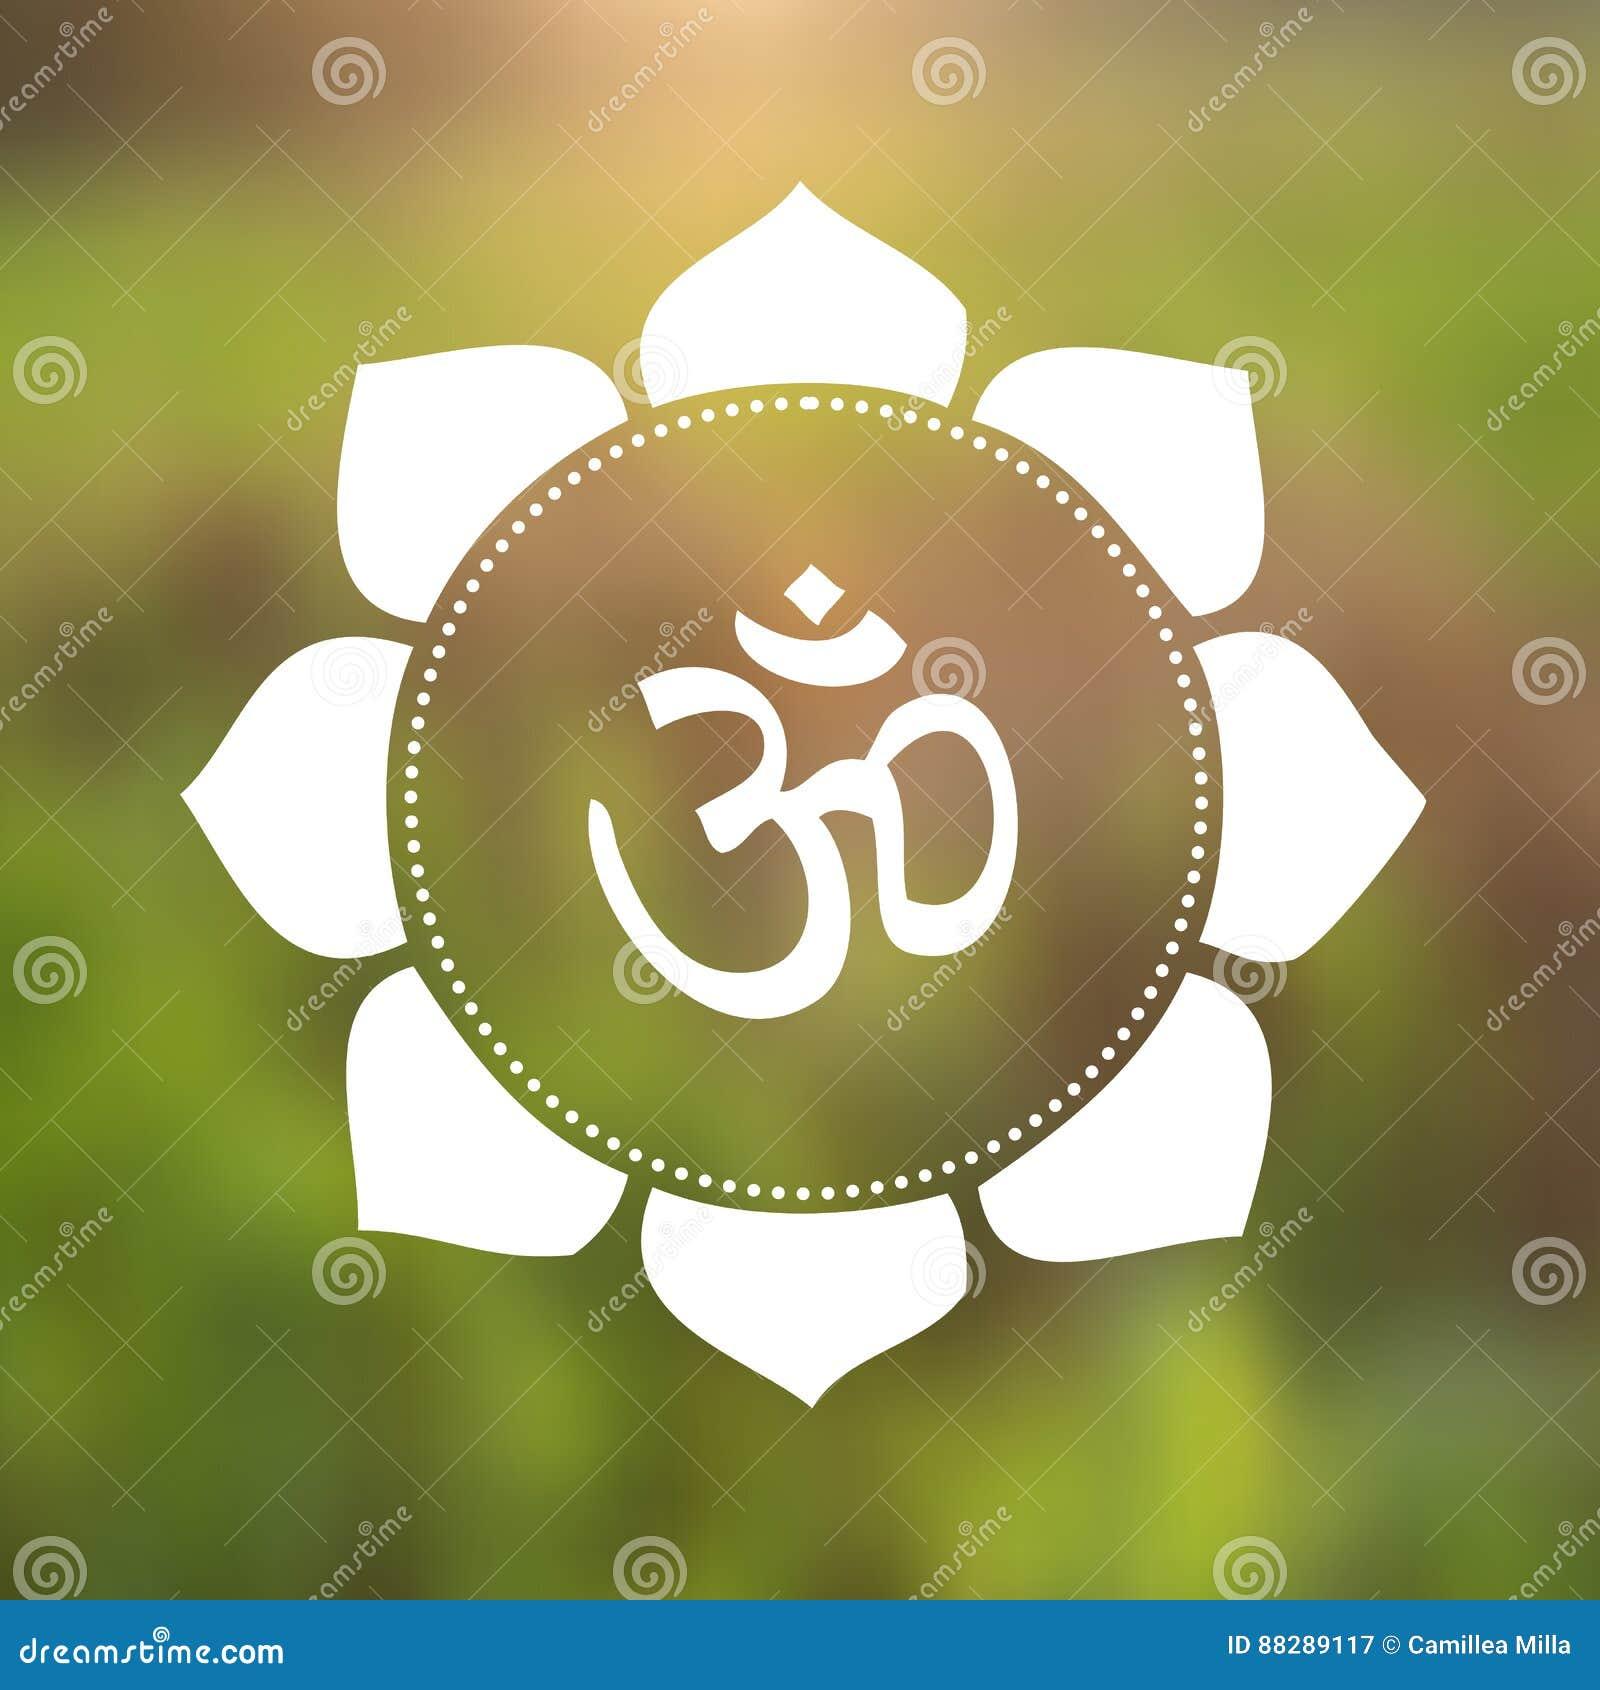 Vector om symbol hindu in lotus flower mandala illustration stock vector om symbol hindu in lotus flower mandala illustration dhlflorist Gallery